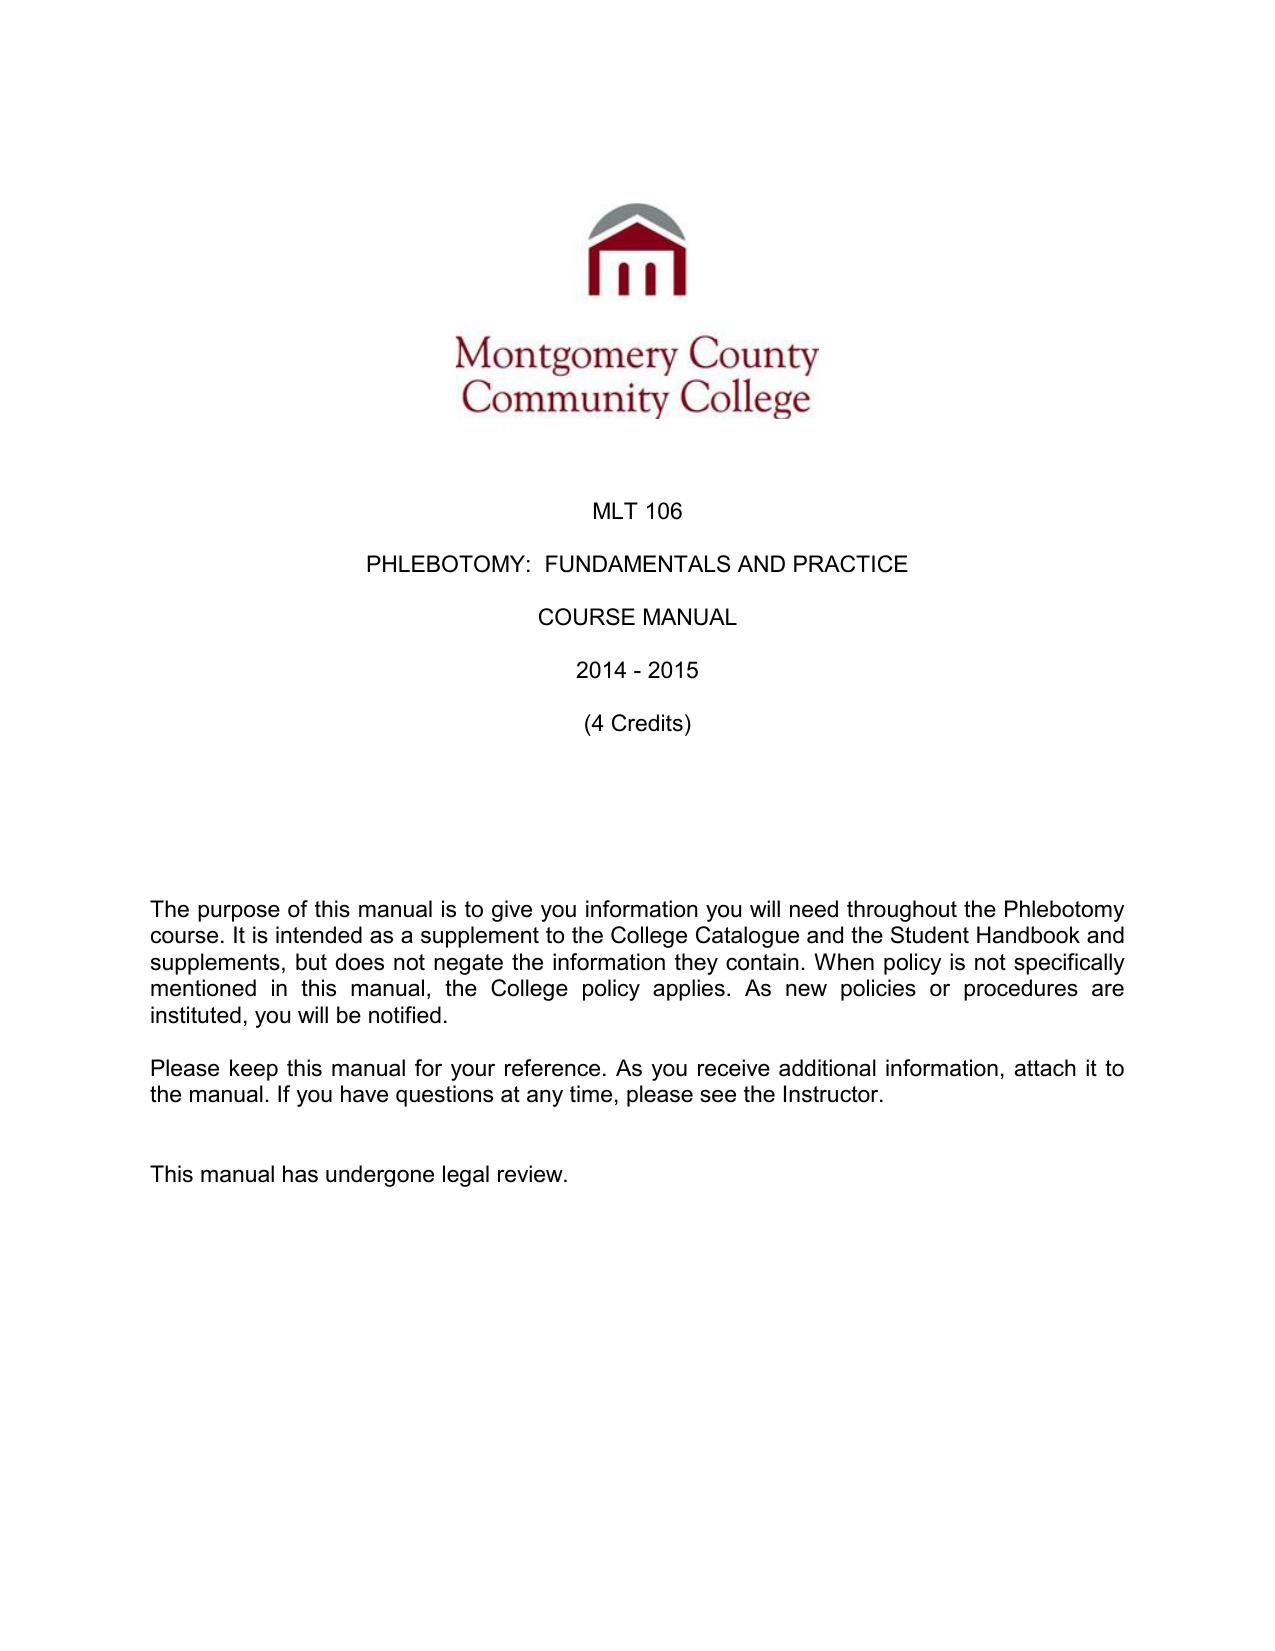 Mlt 106 Phlebotomy Montgomery County Community College